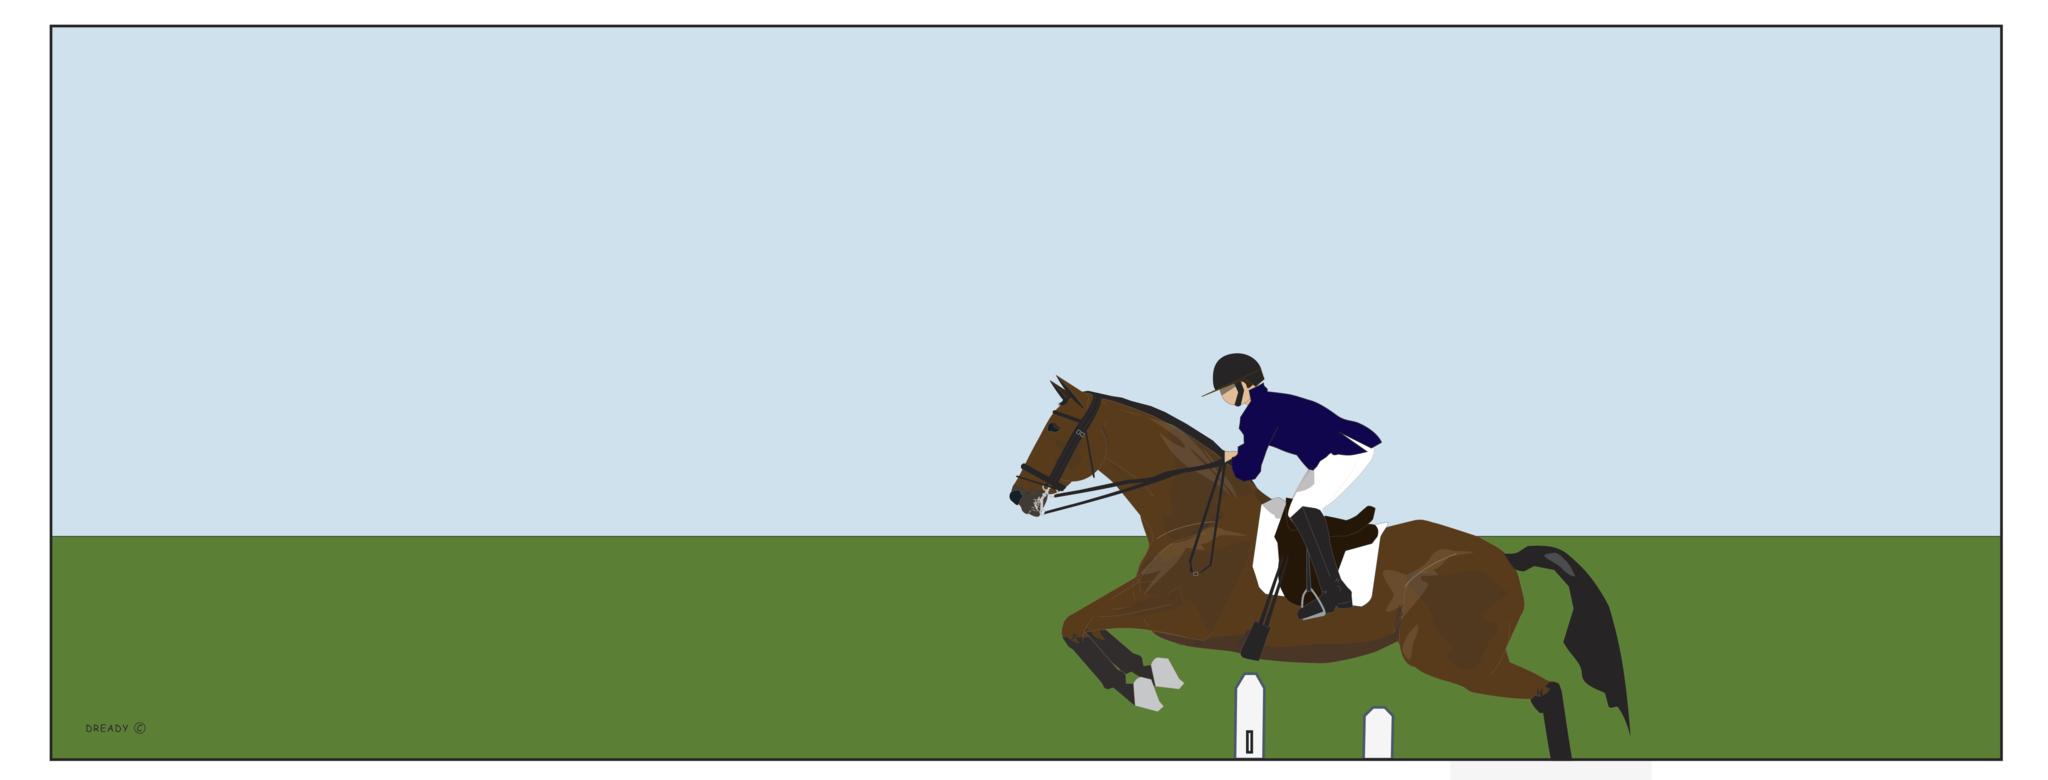 Jumping Horse - Boy